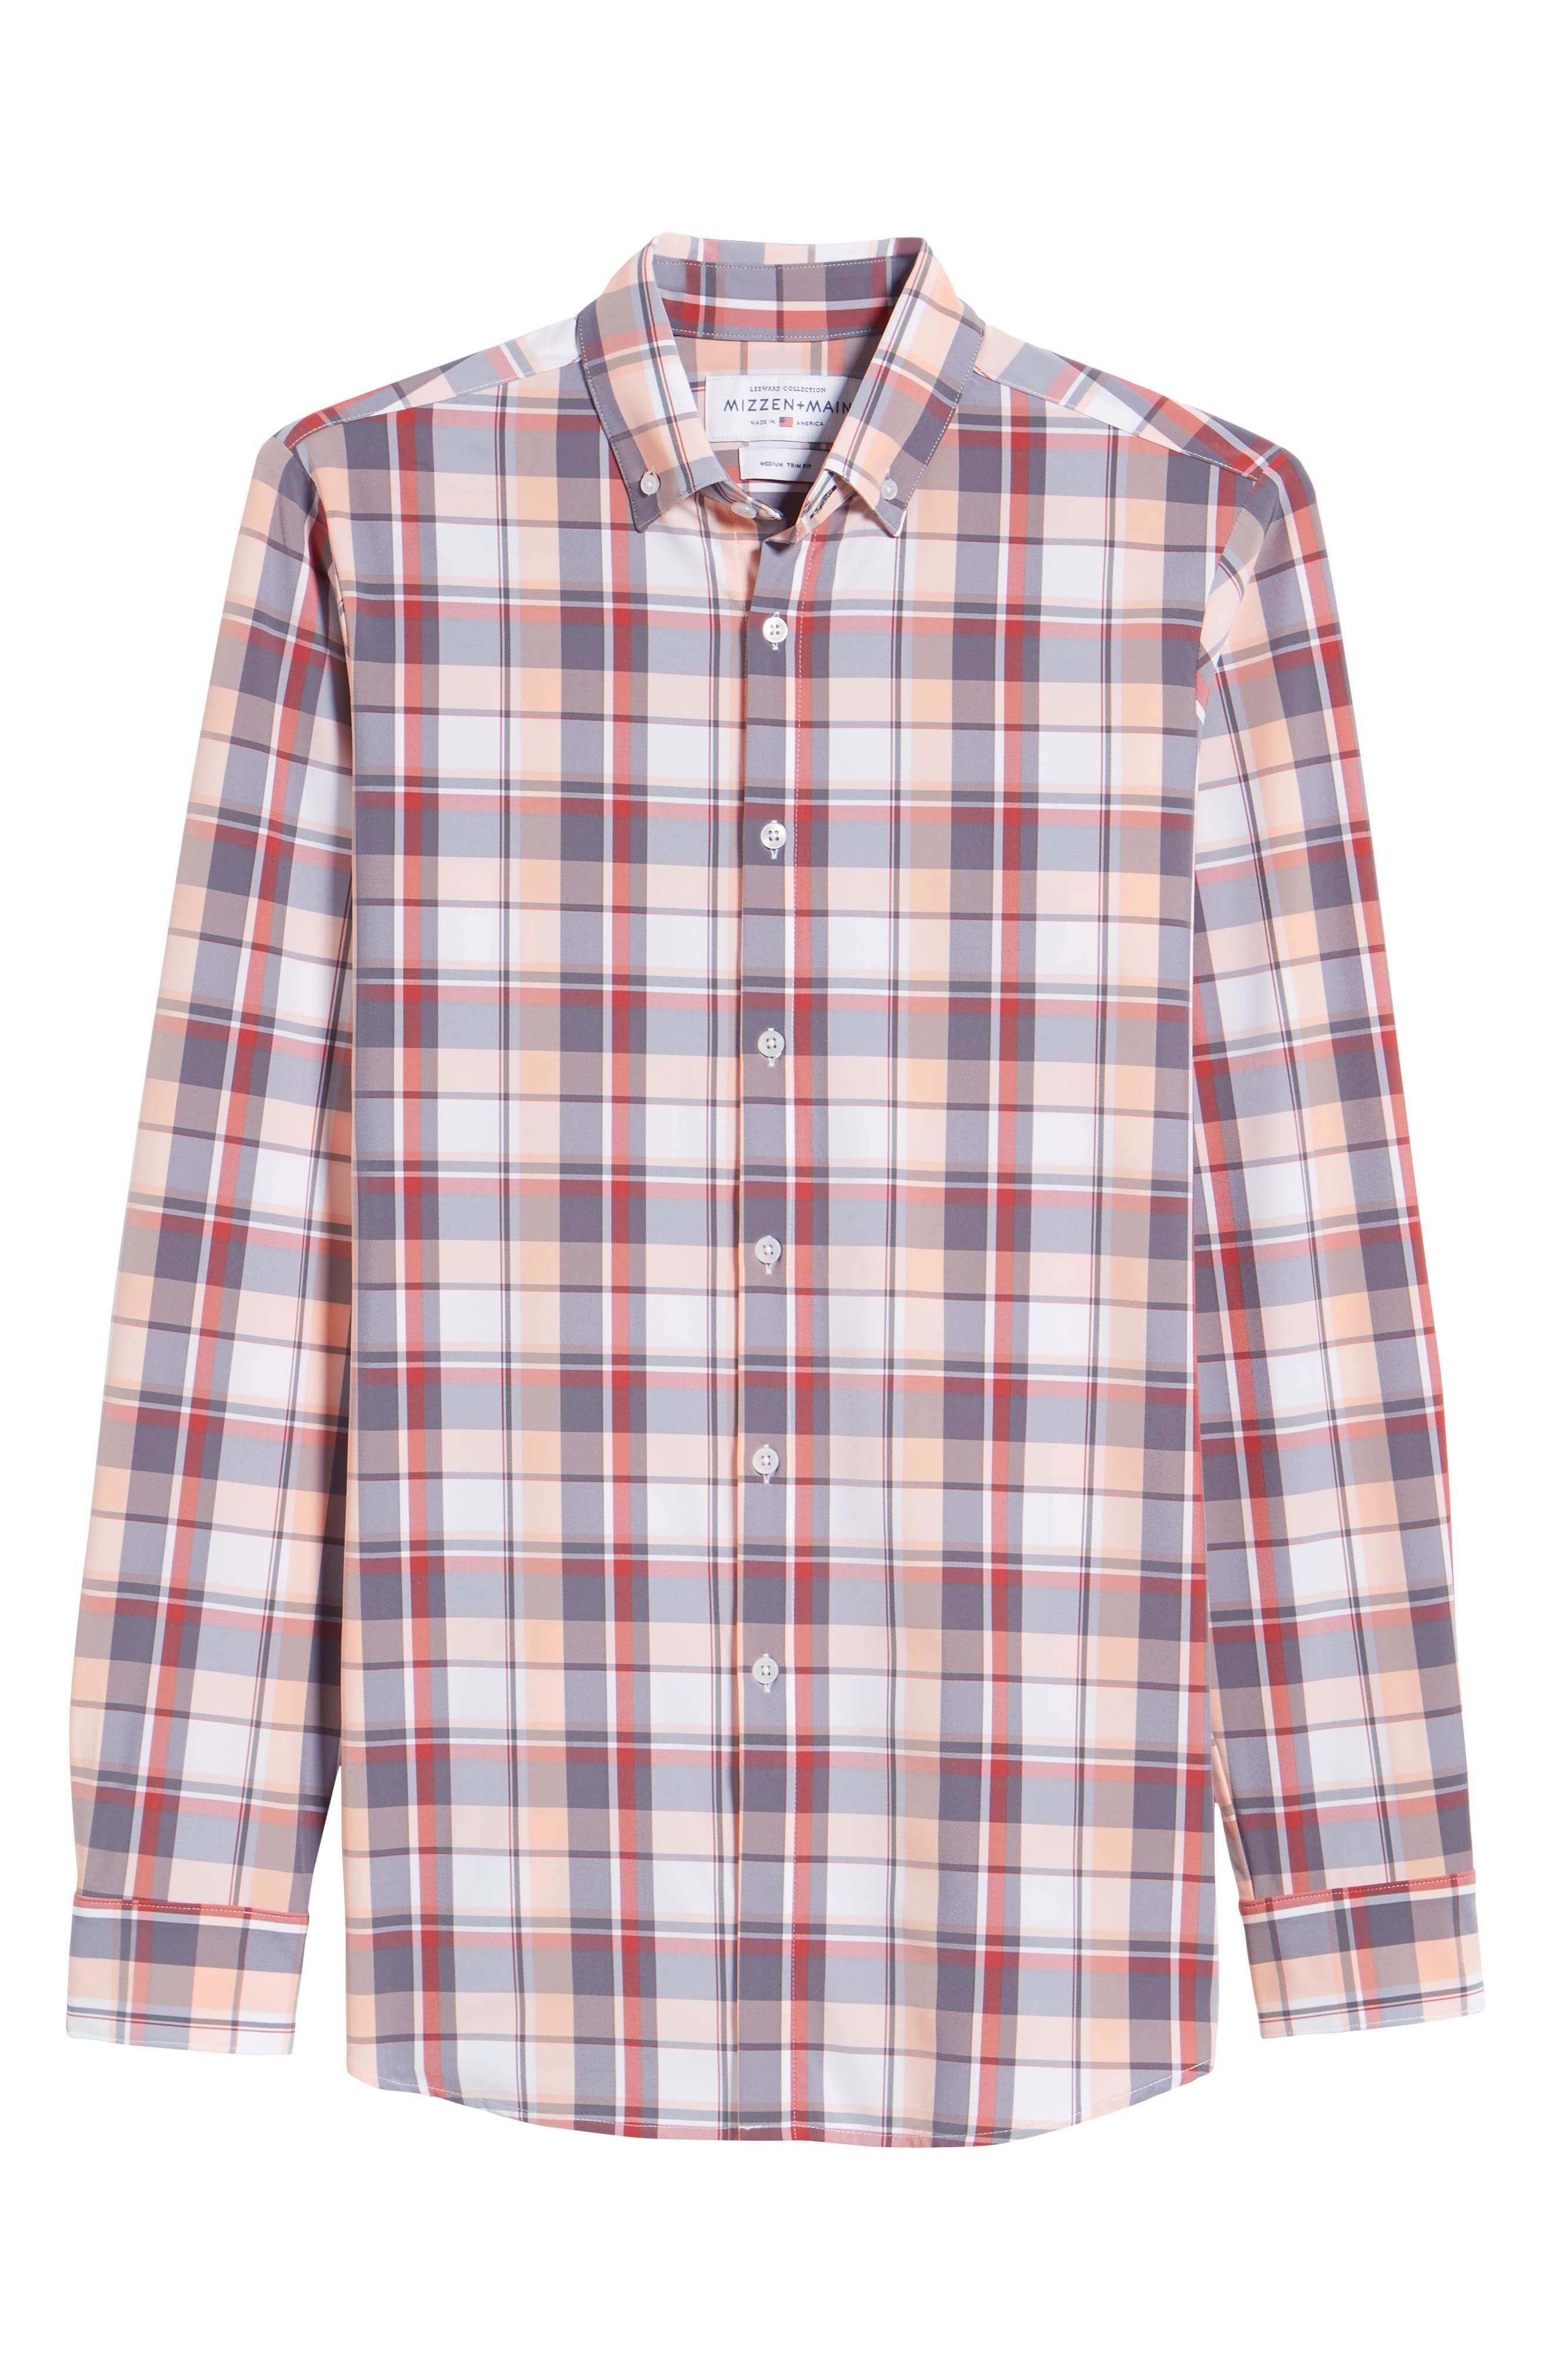 Brazos Slim Fit Madras Plaid Performance Sport Shirt,                             Alternate thumbnail 6, color,                             PEACH